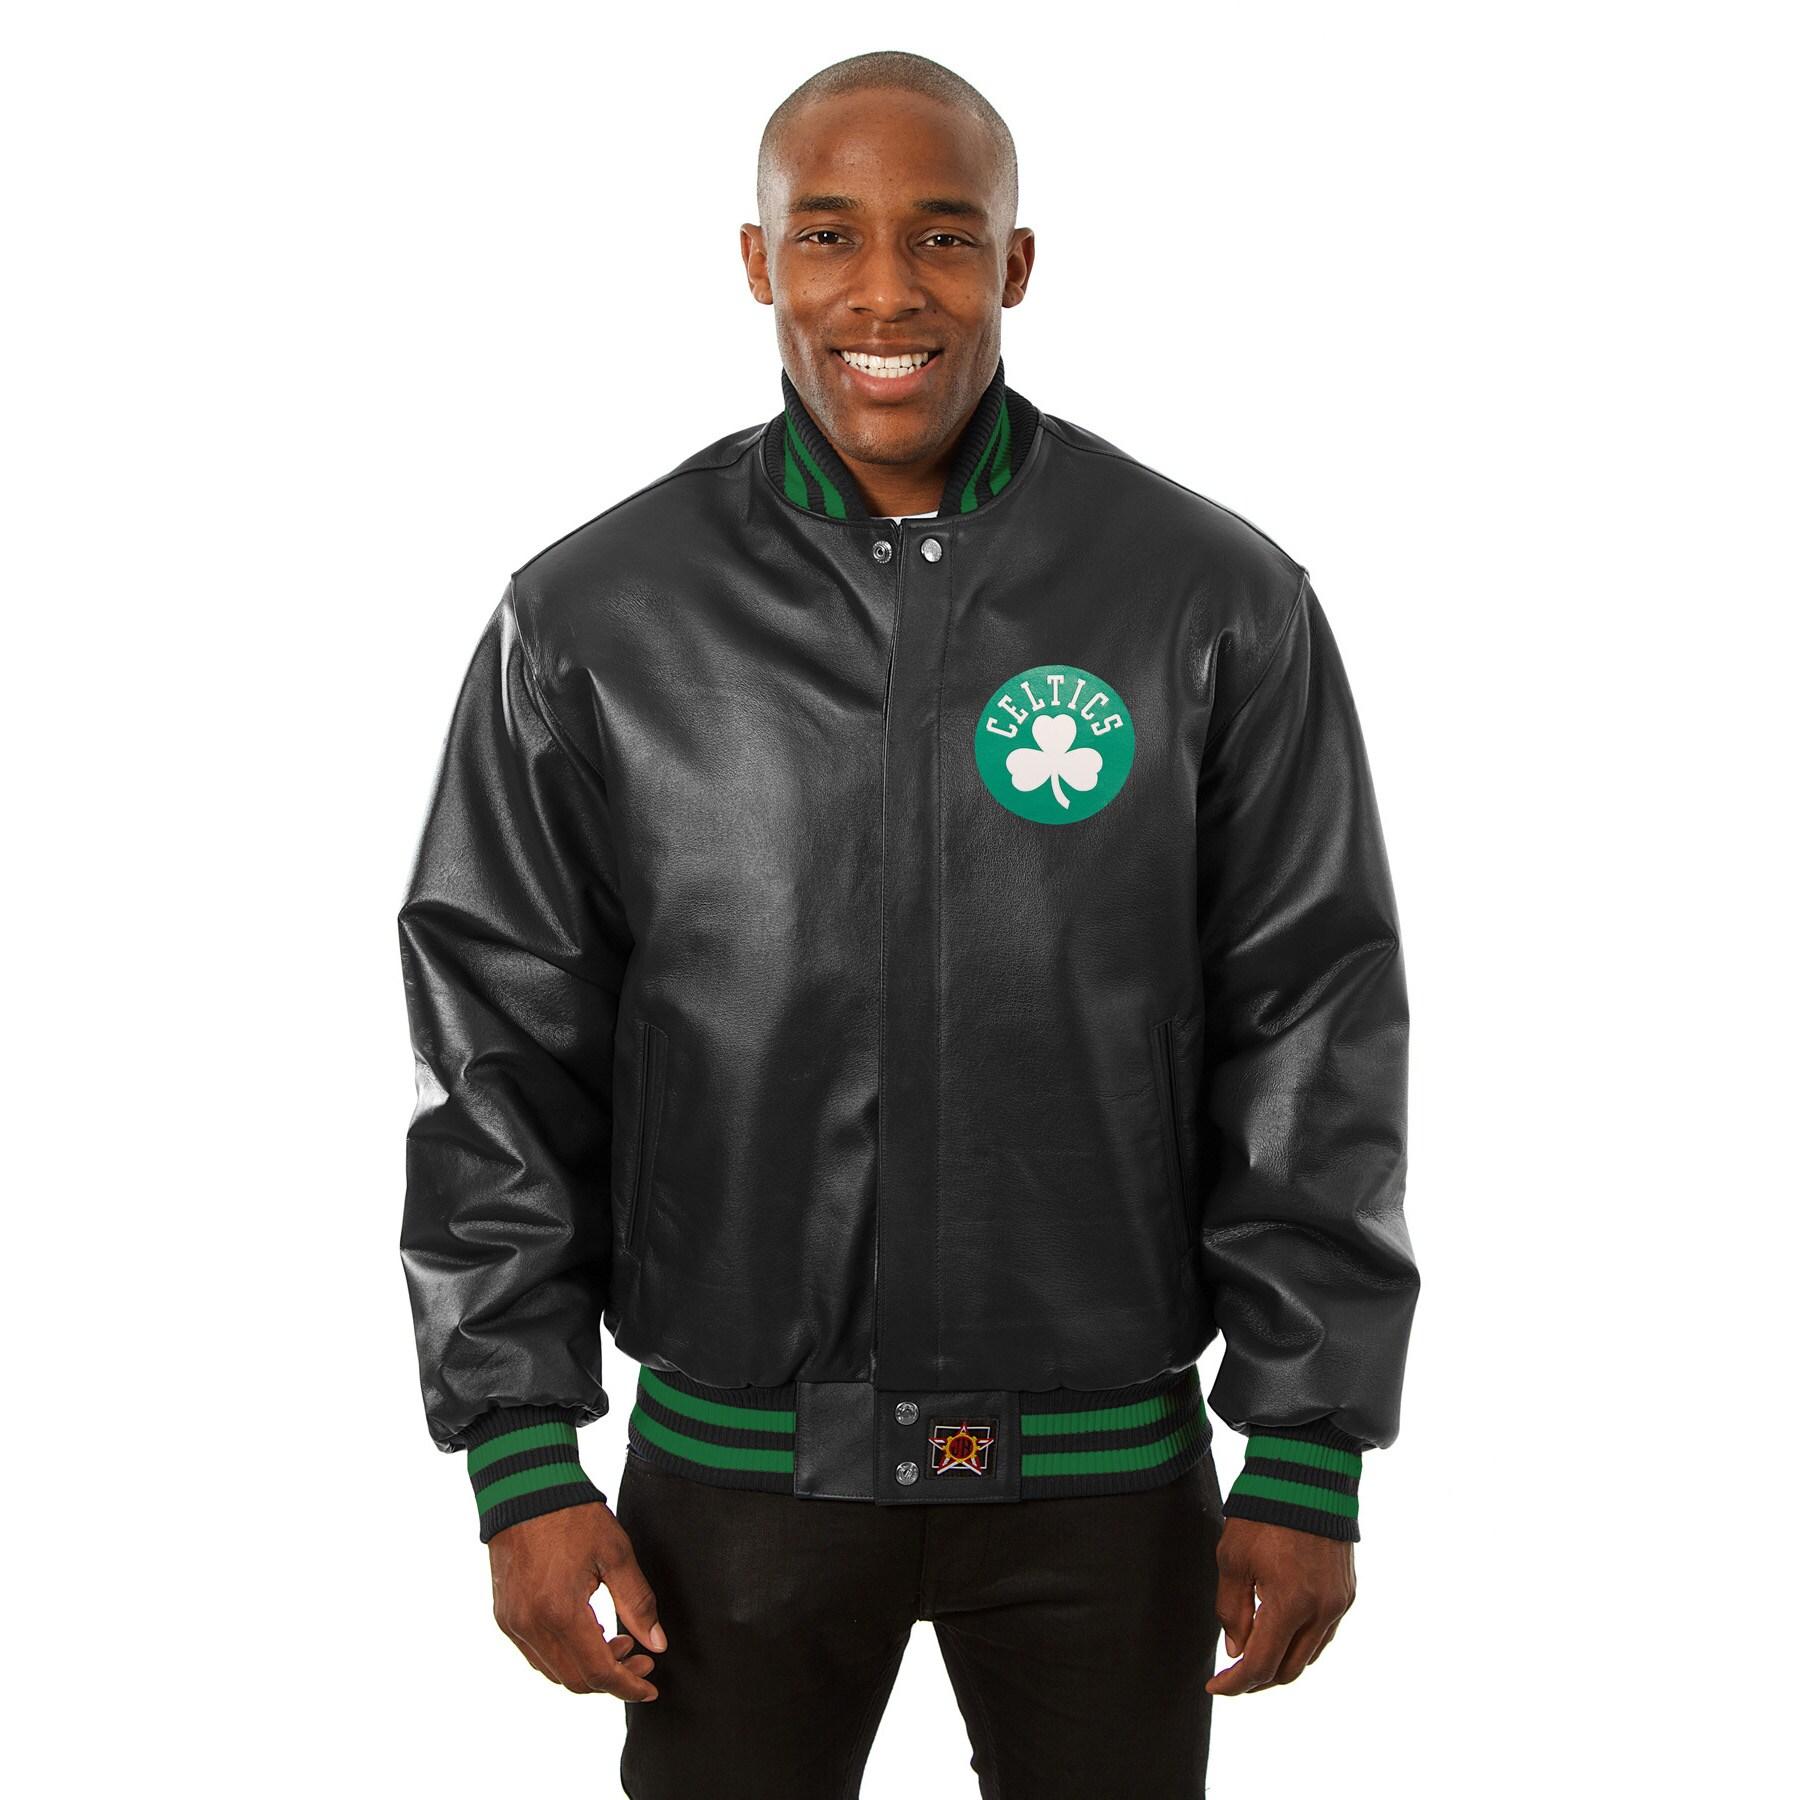 Boston Celtics JH Design Domestic Team Color Leather Jacket - Black